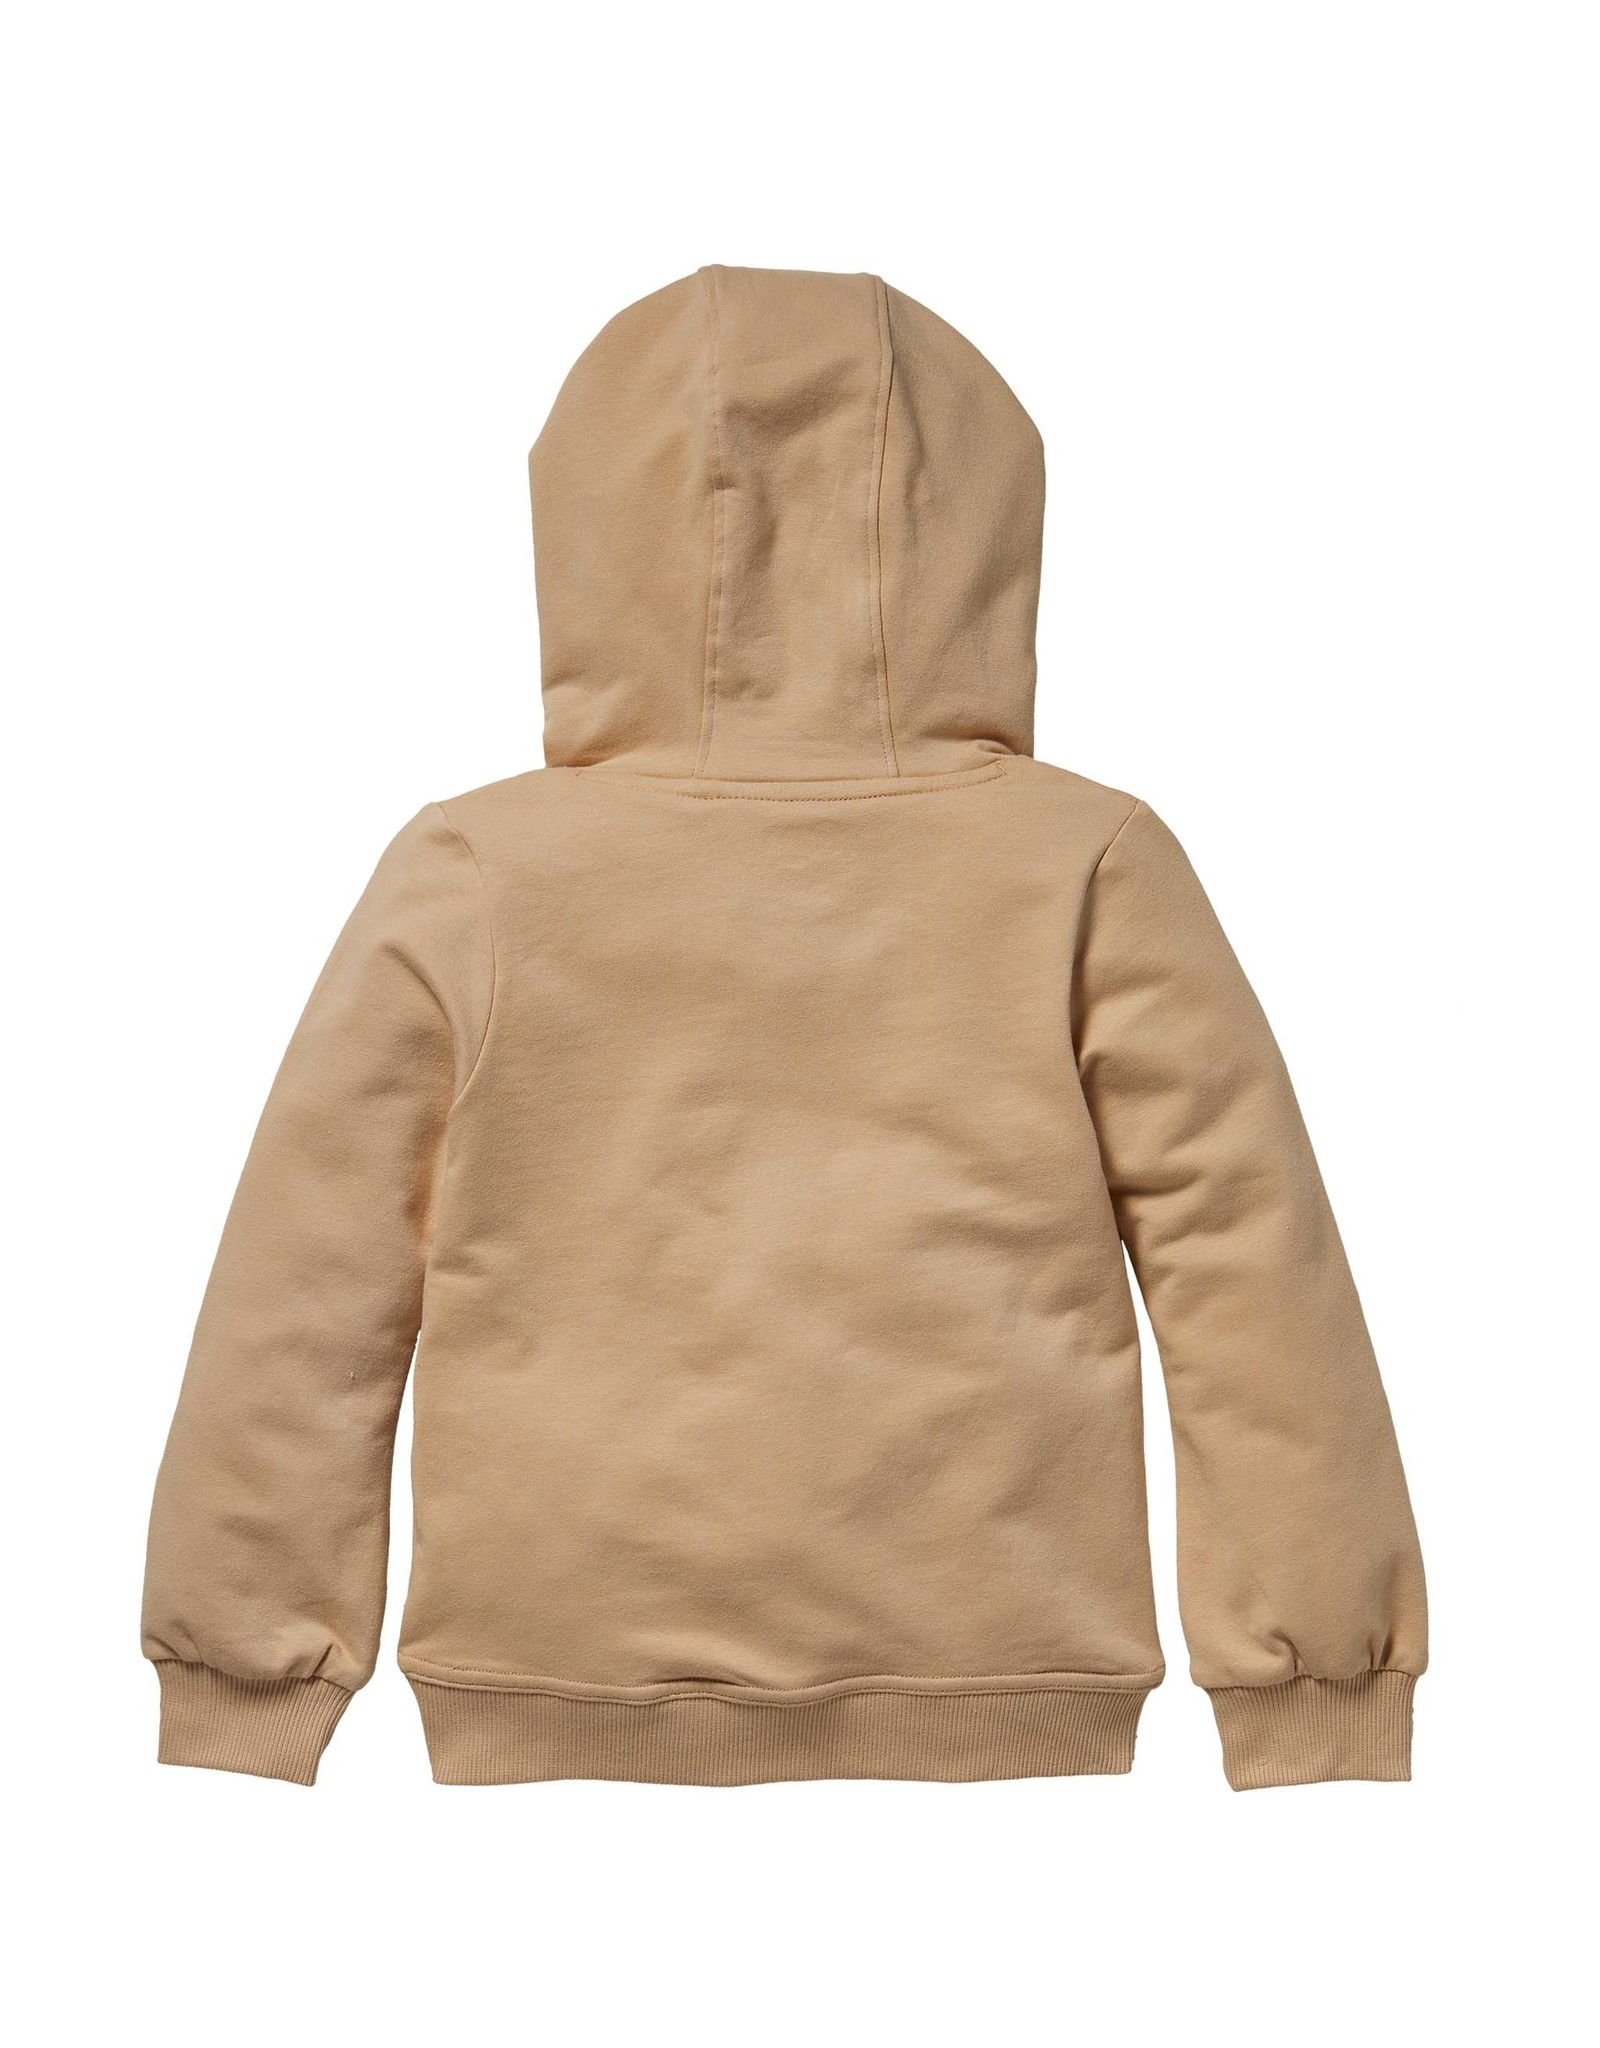 Quapi Quapi sweater KELCEY off white